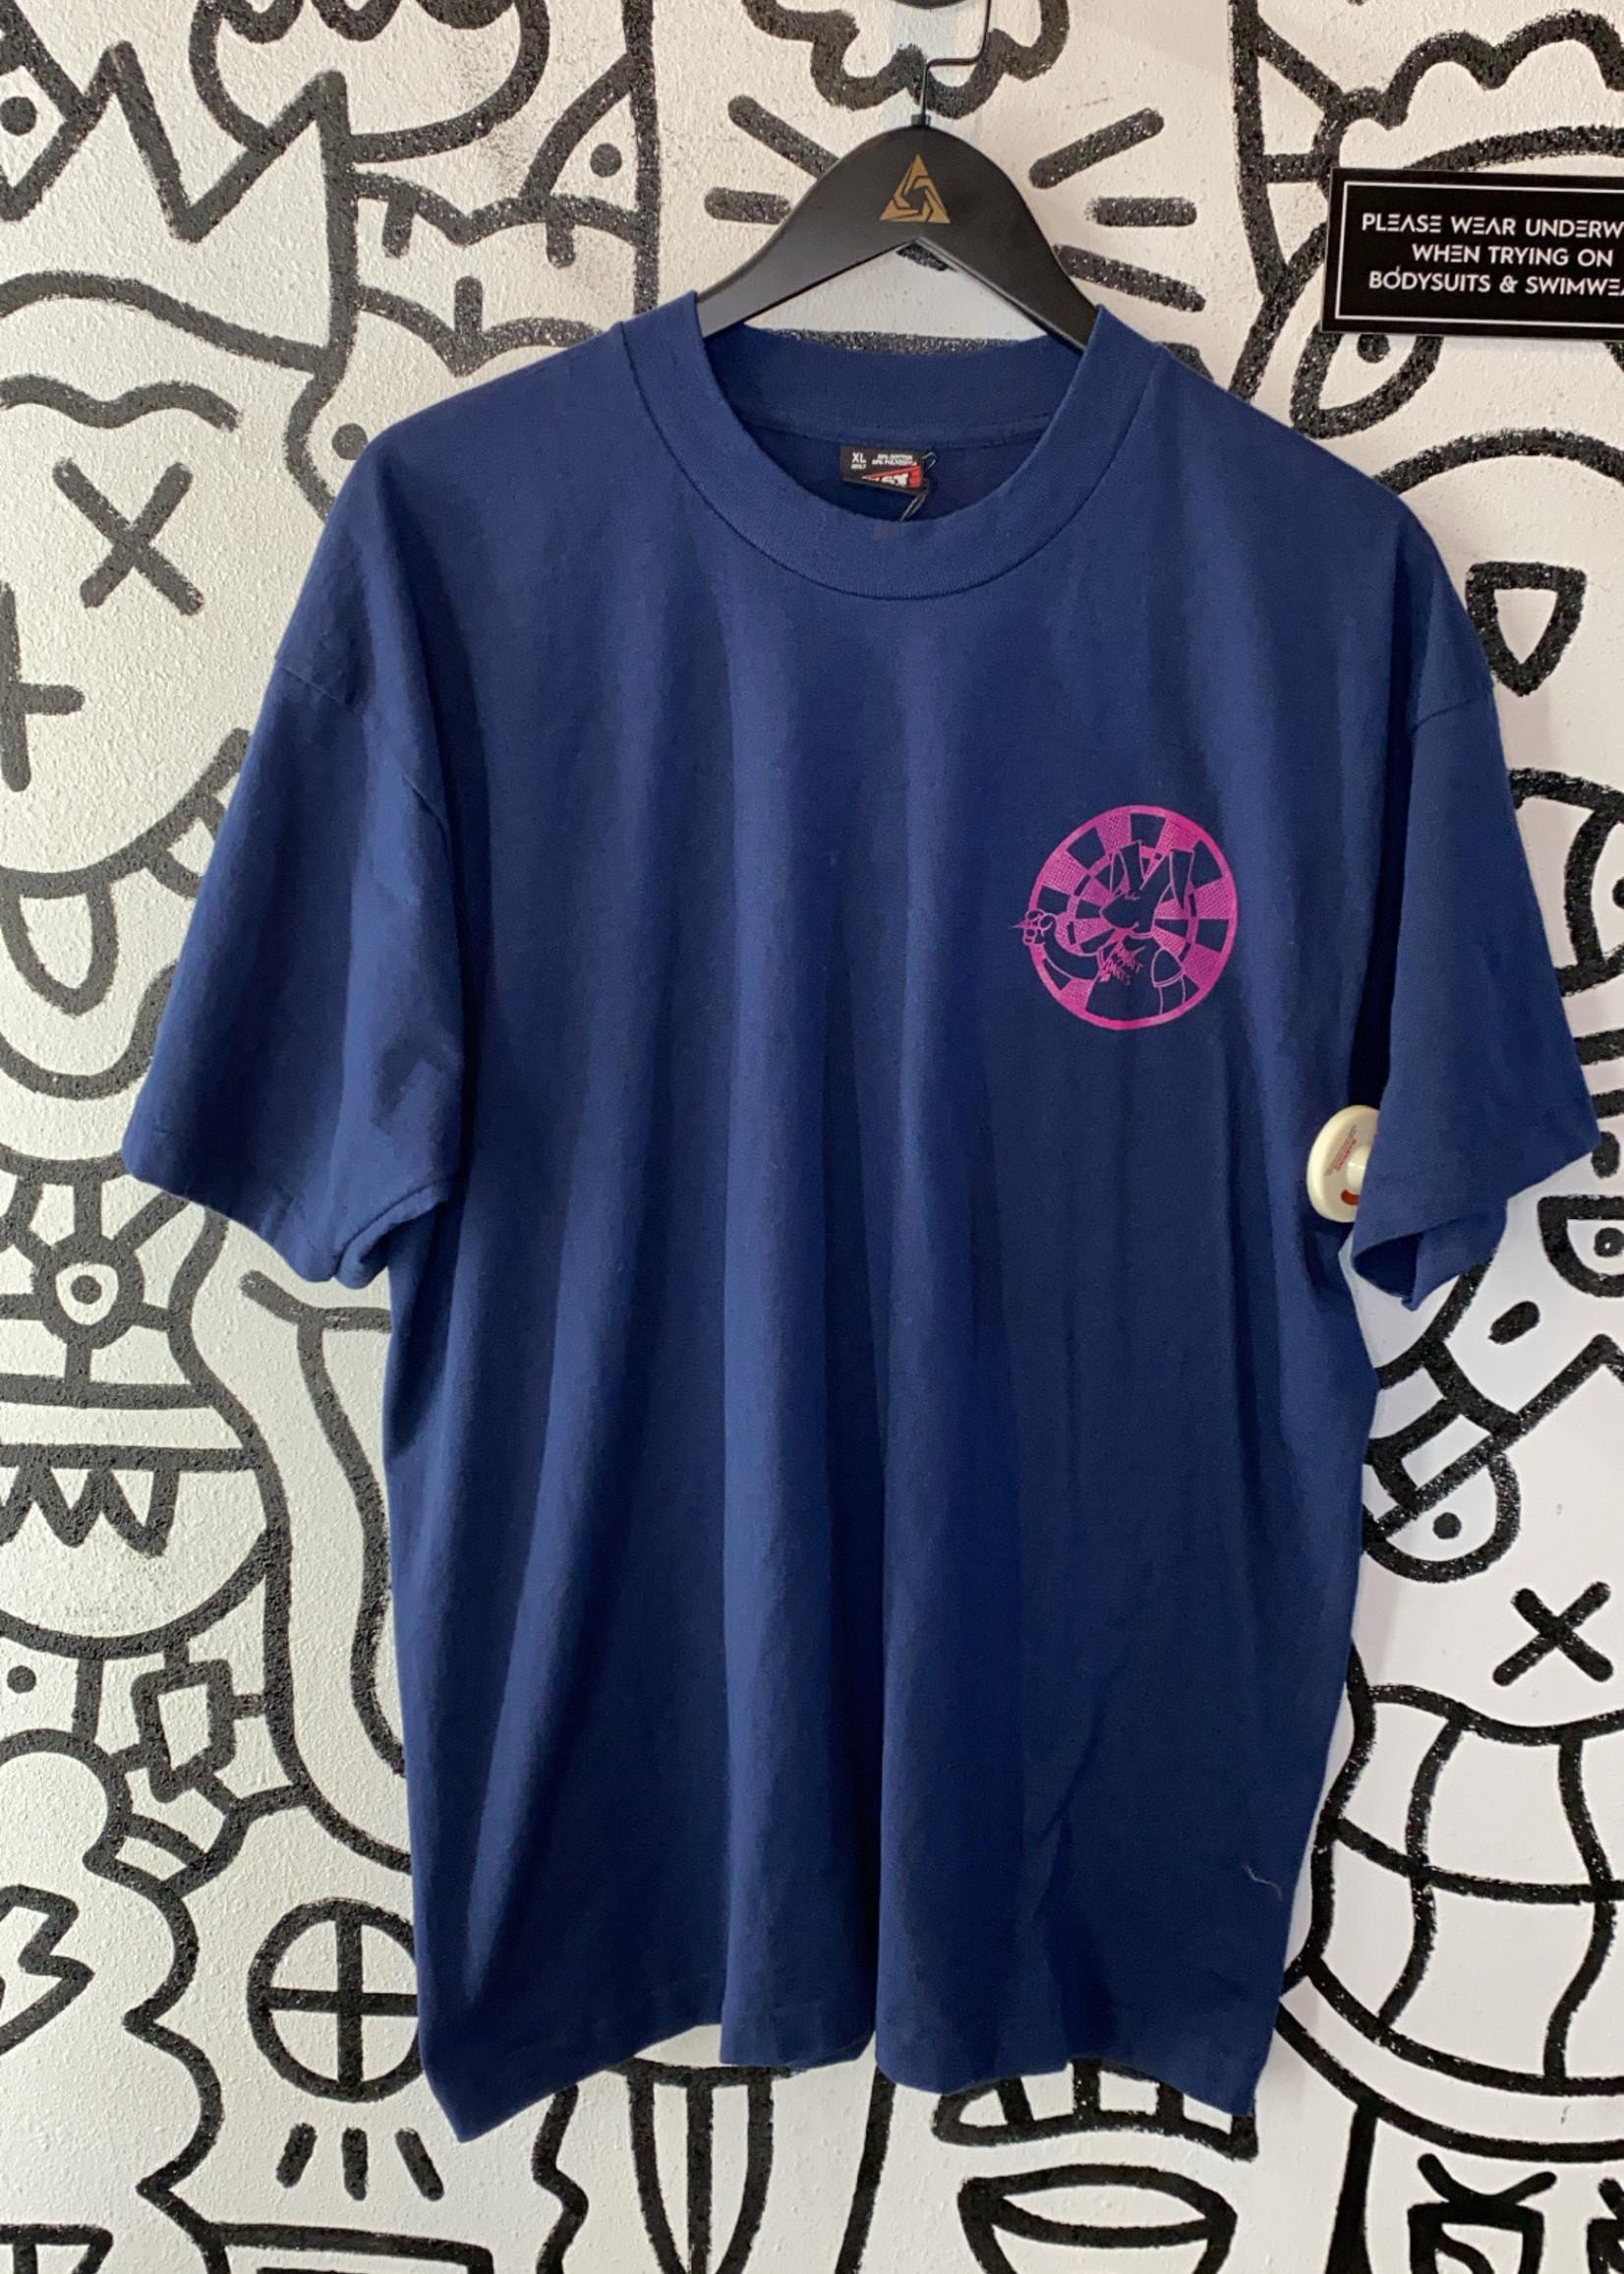 Vintage Navy Blue Rabbit Darts shirt XL